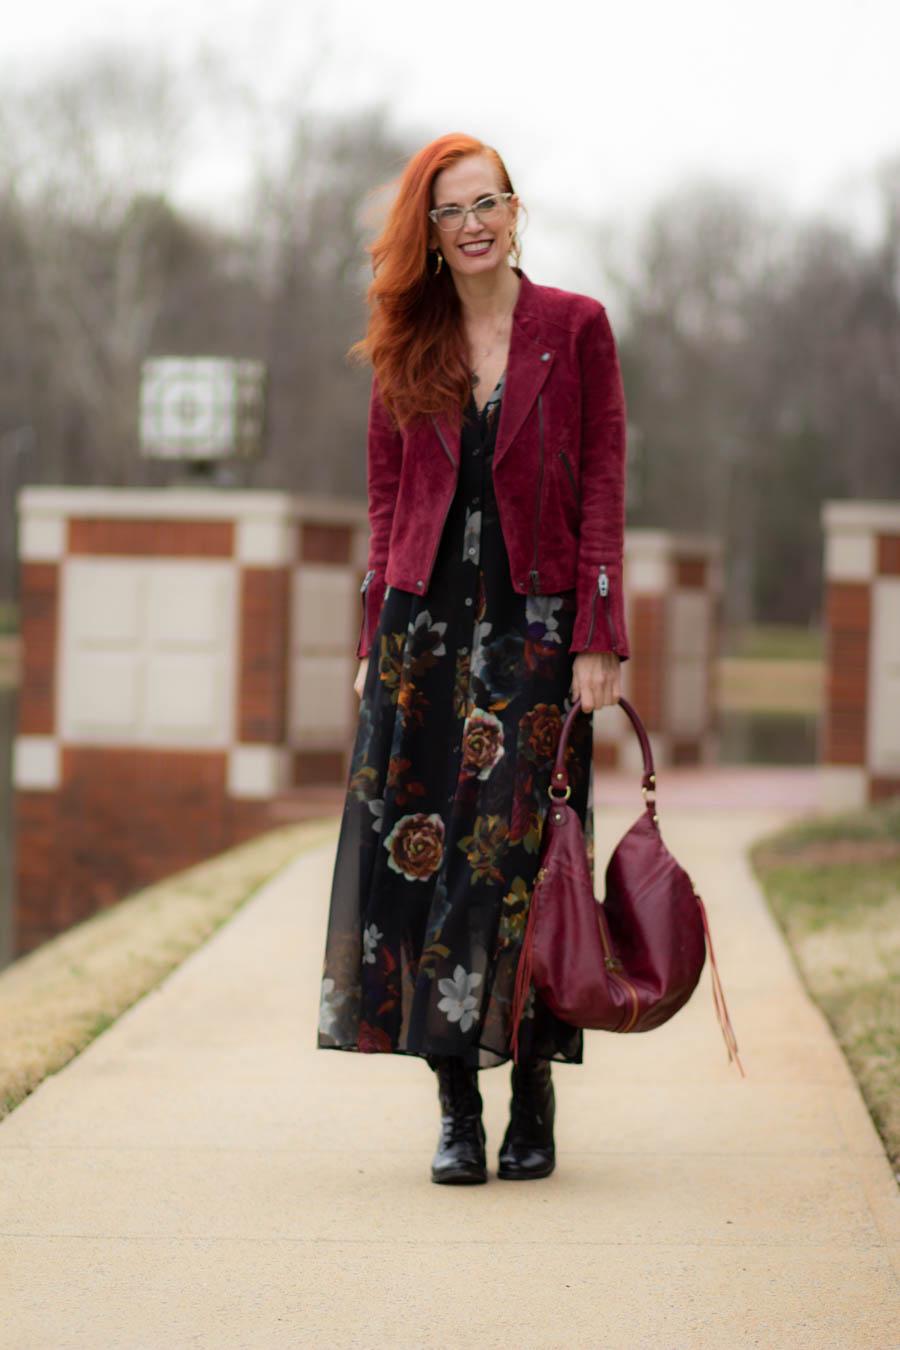 Fashion uniform for winter